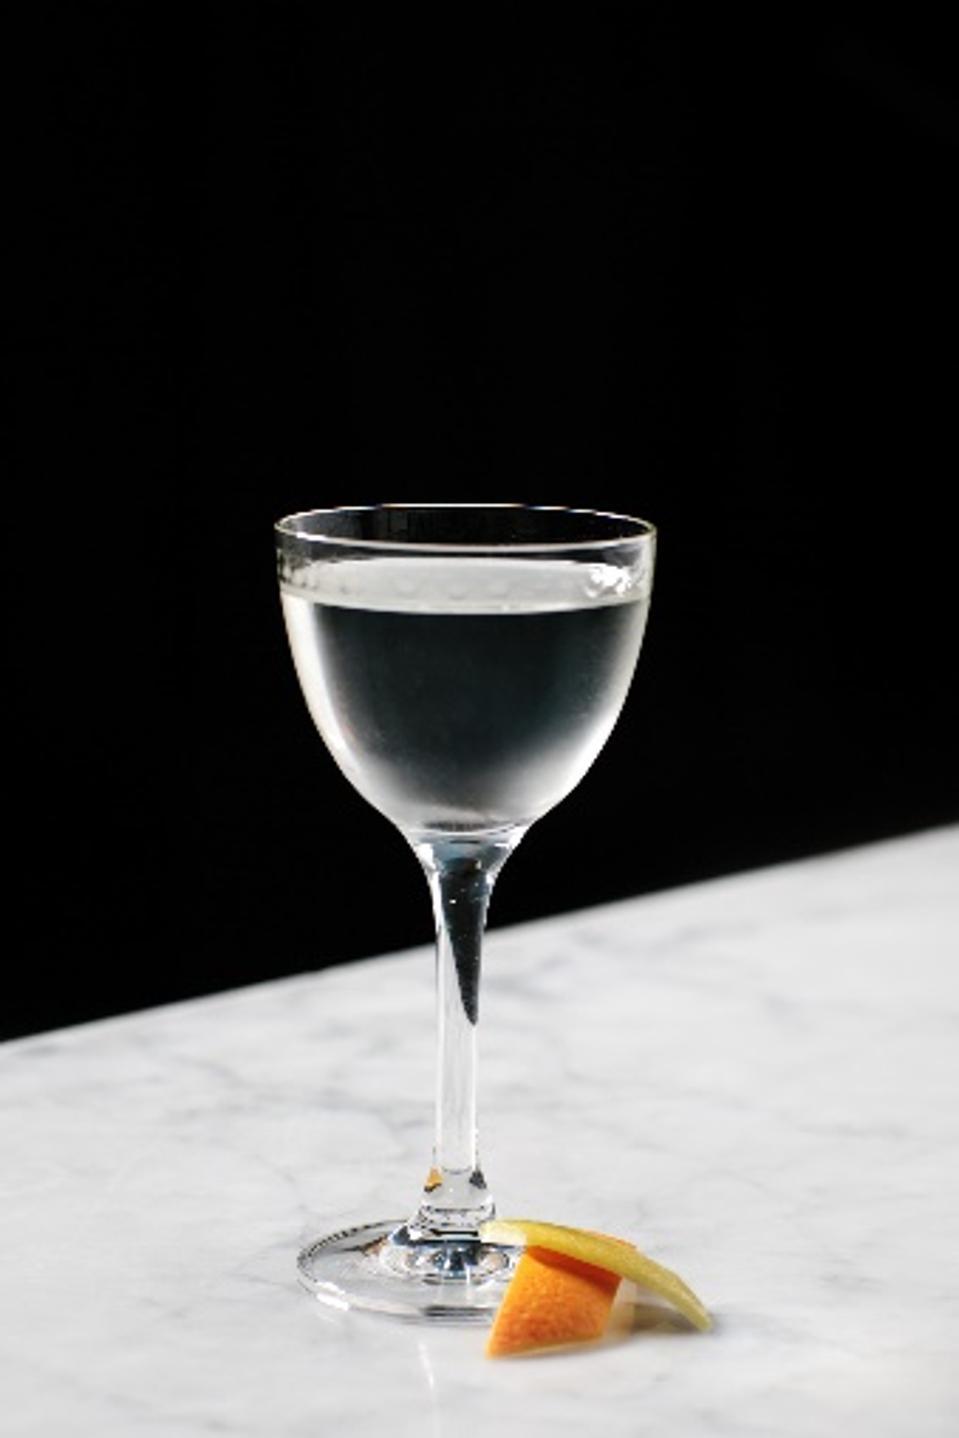 The British Bellringer cocktail at InterContinental London Park Lane.